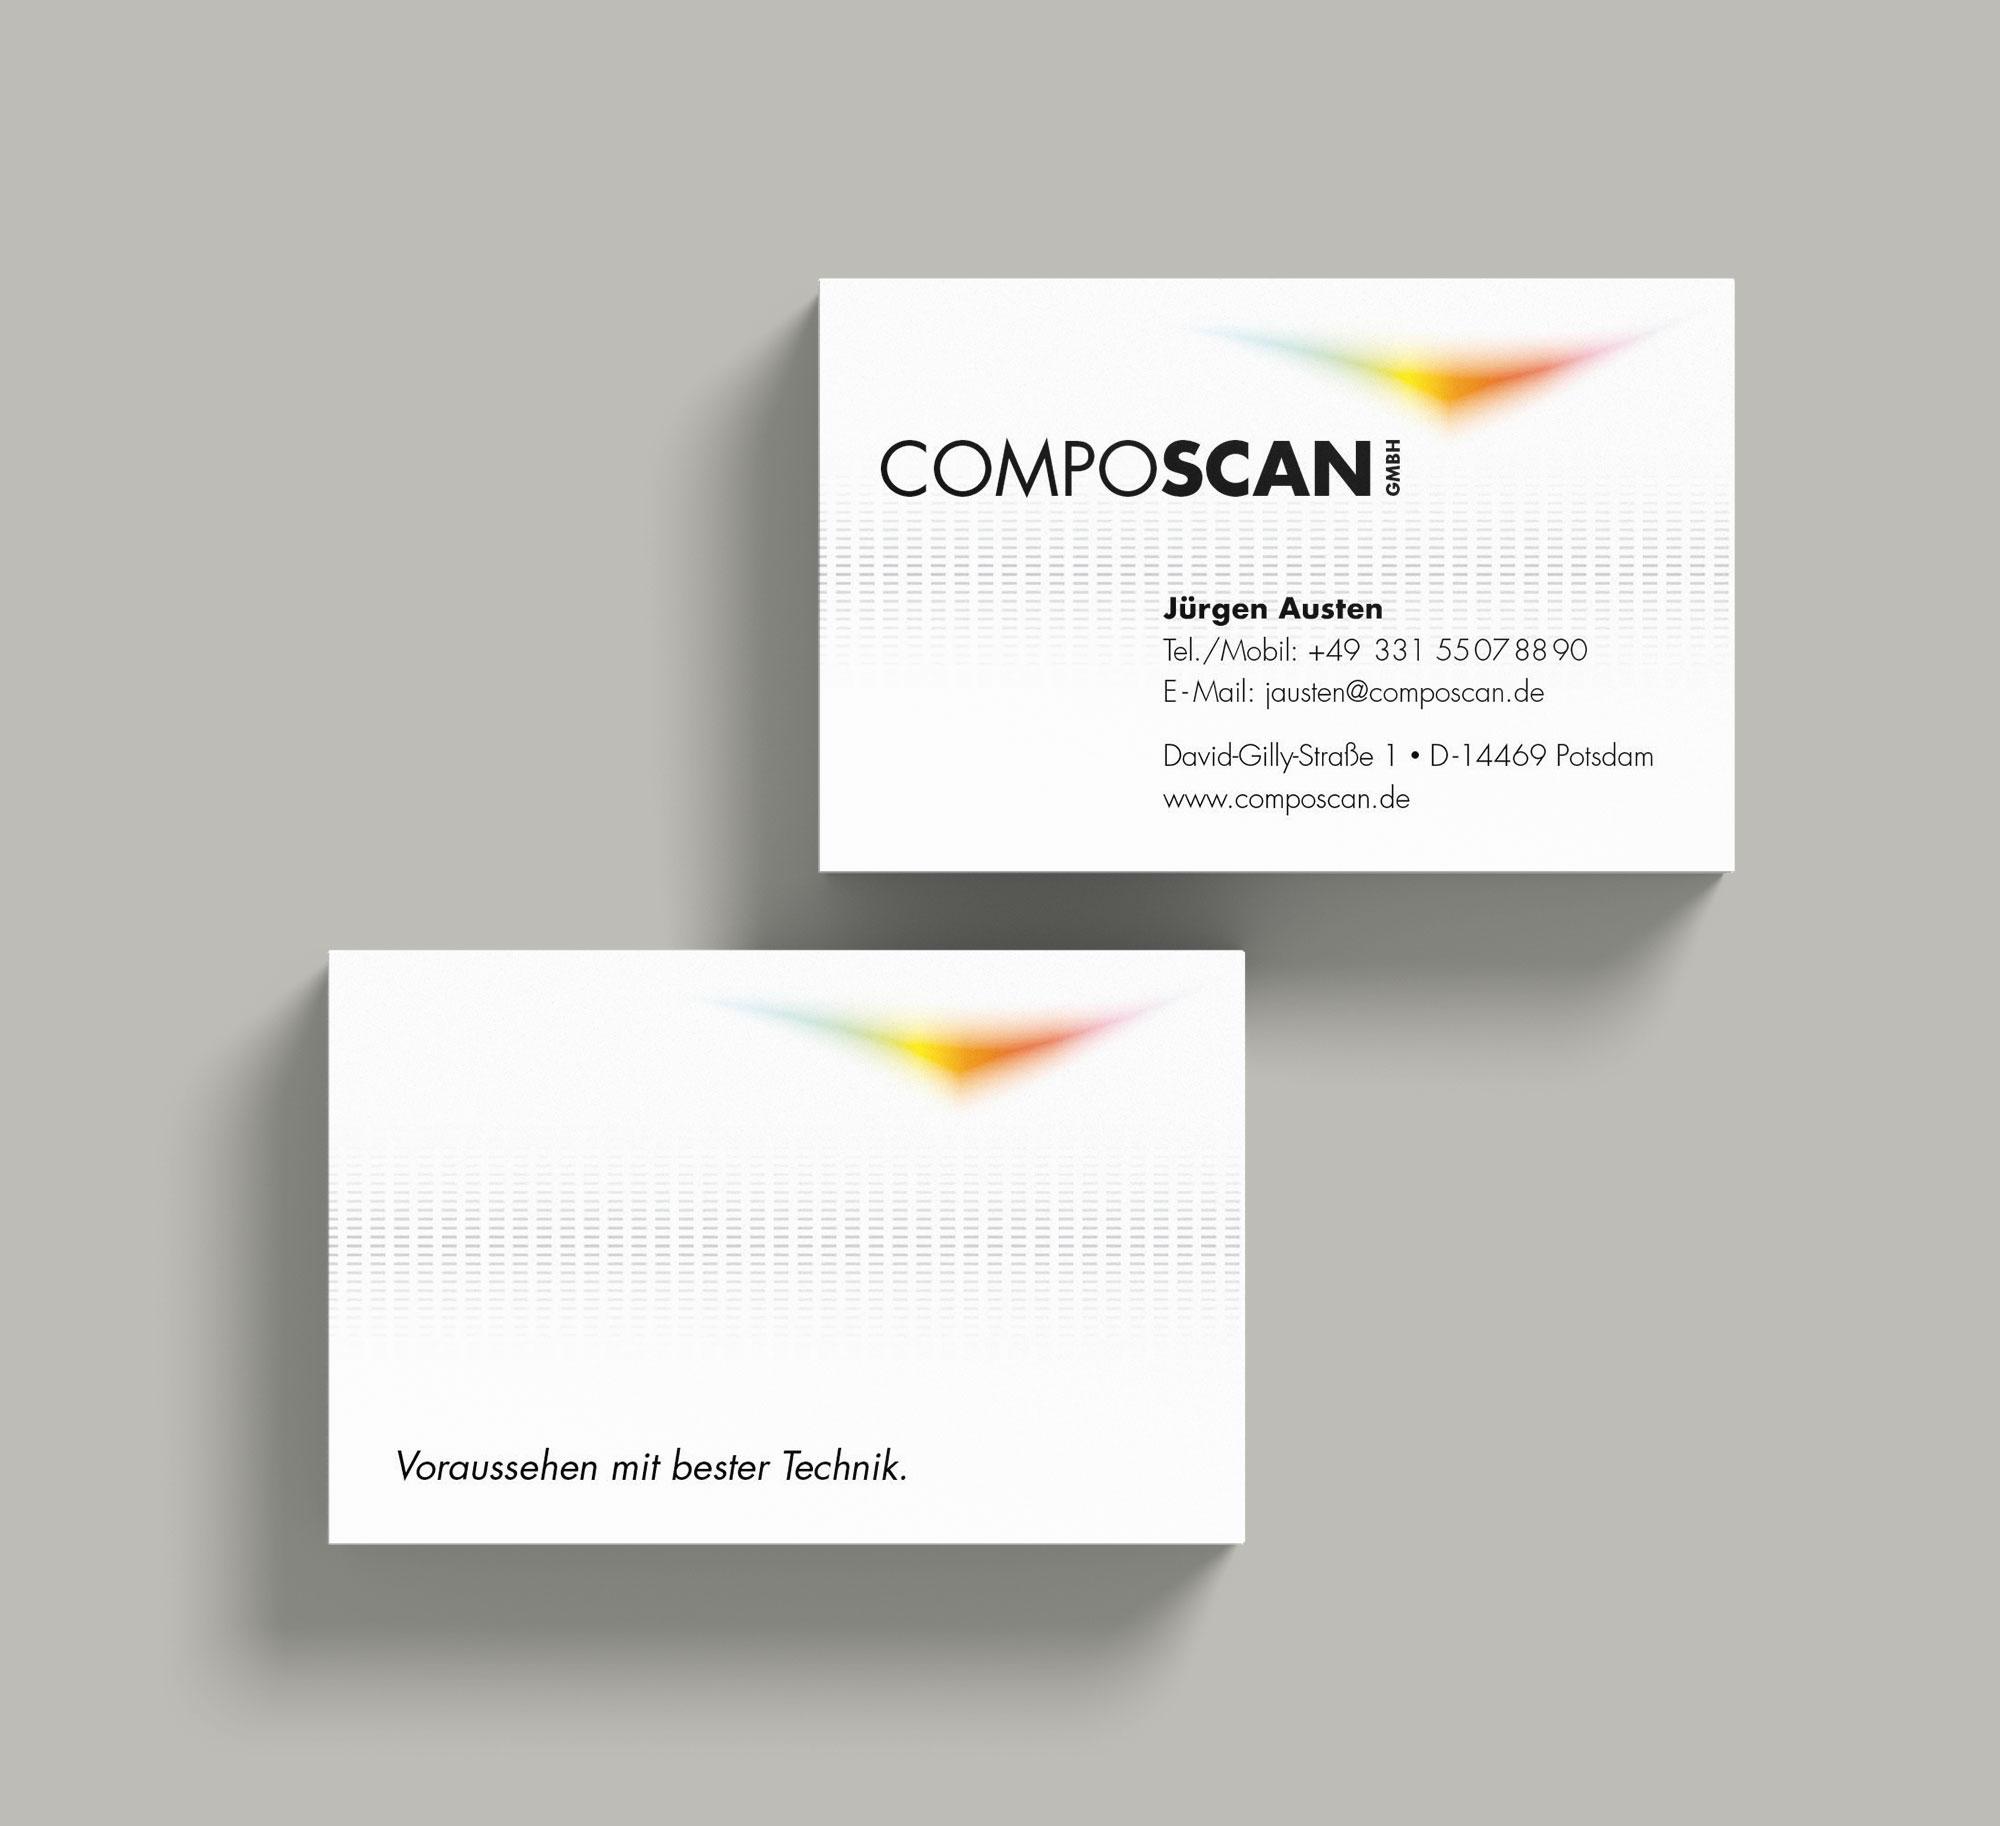 3_Composcan_Visitenkarte_Web